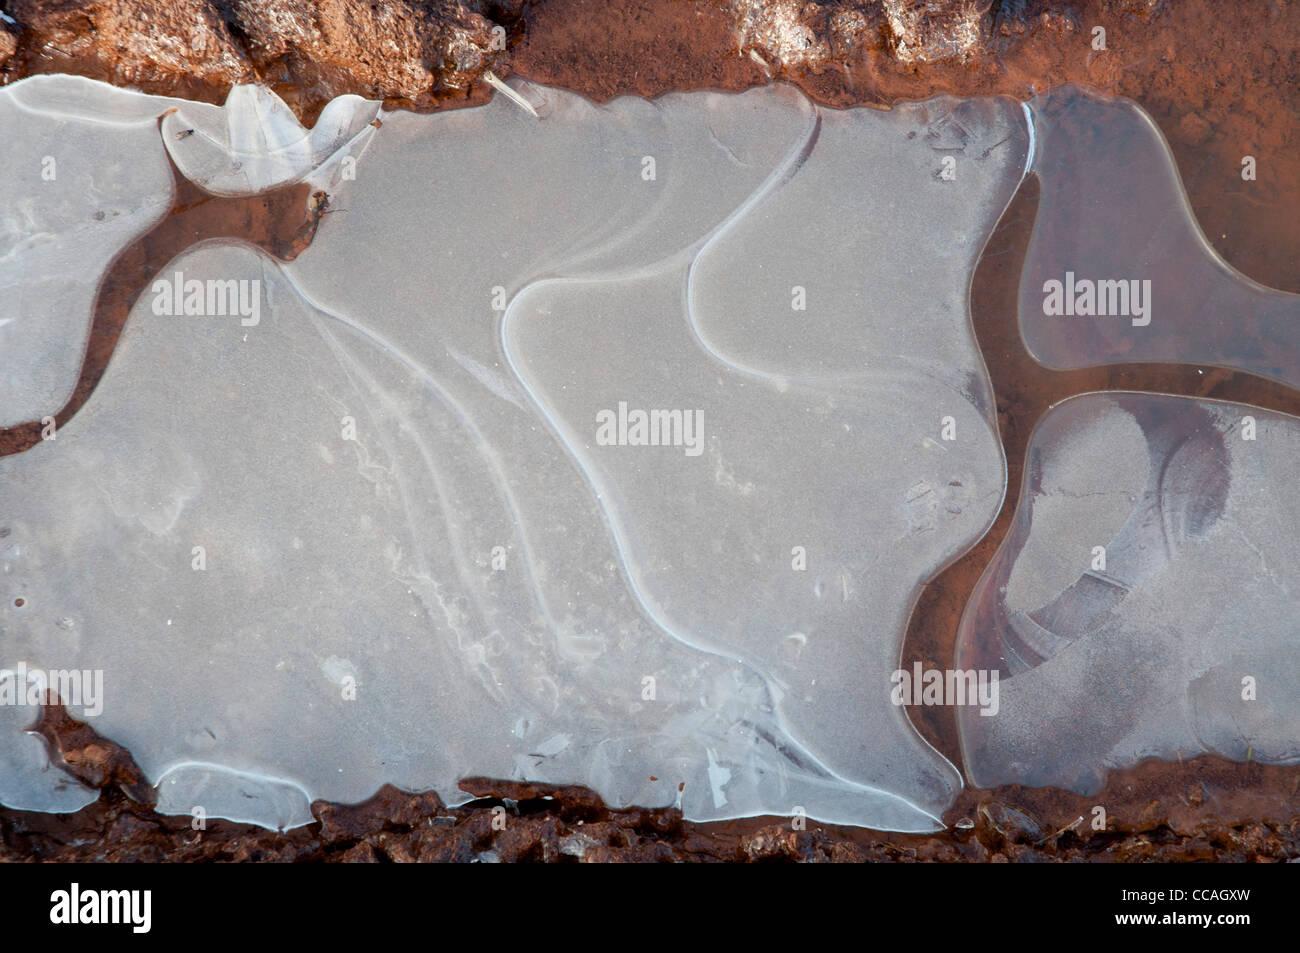 Charco de agua congelada en el barro Imagen De Stock